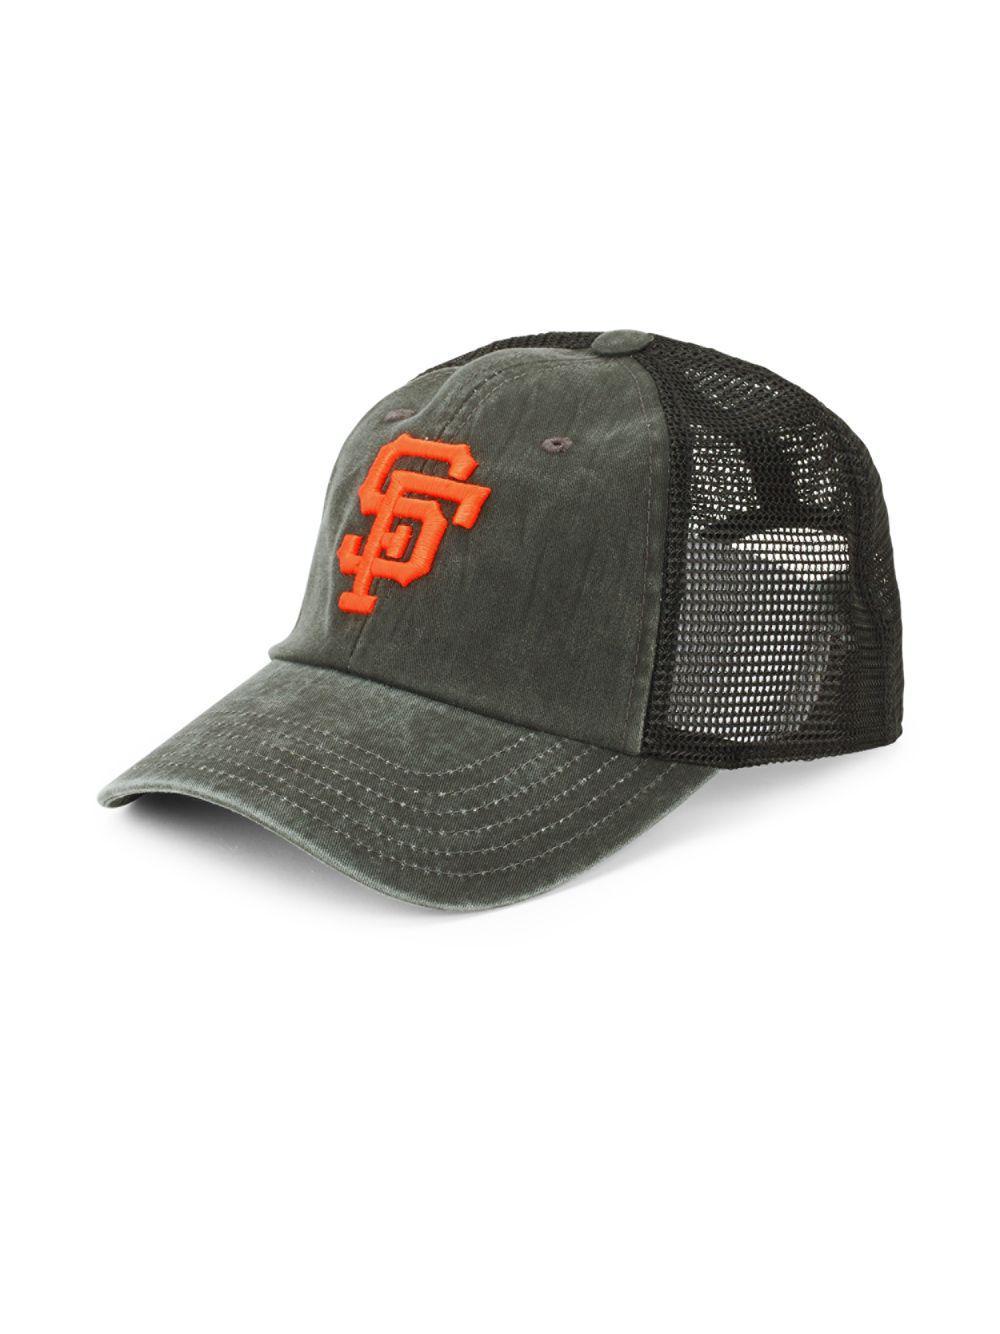 8886f2e5cf8 Lyst - American Needle Embroidered Logo Cotton Baseball Cap in Black ...